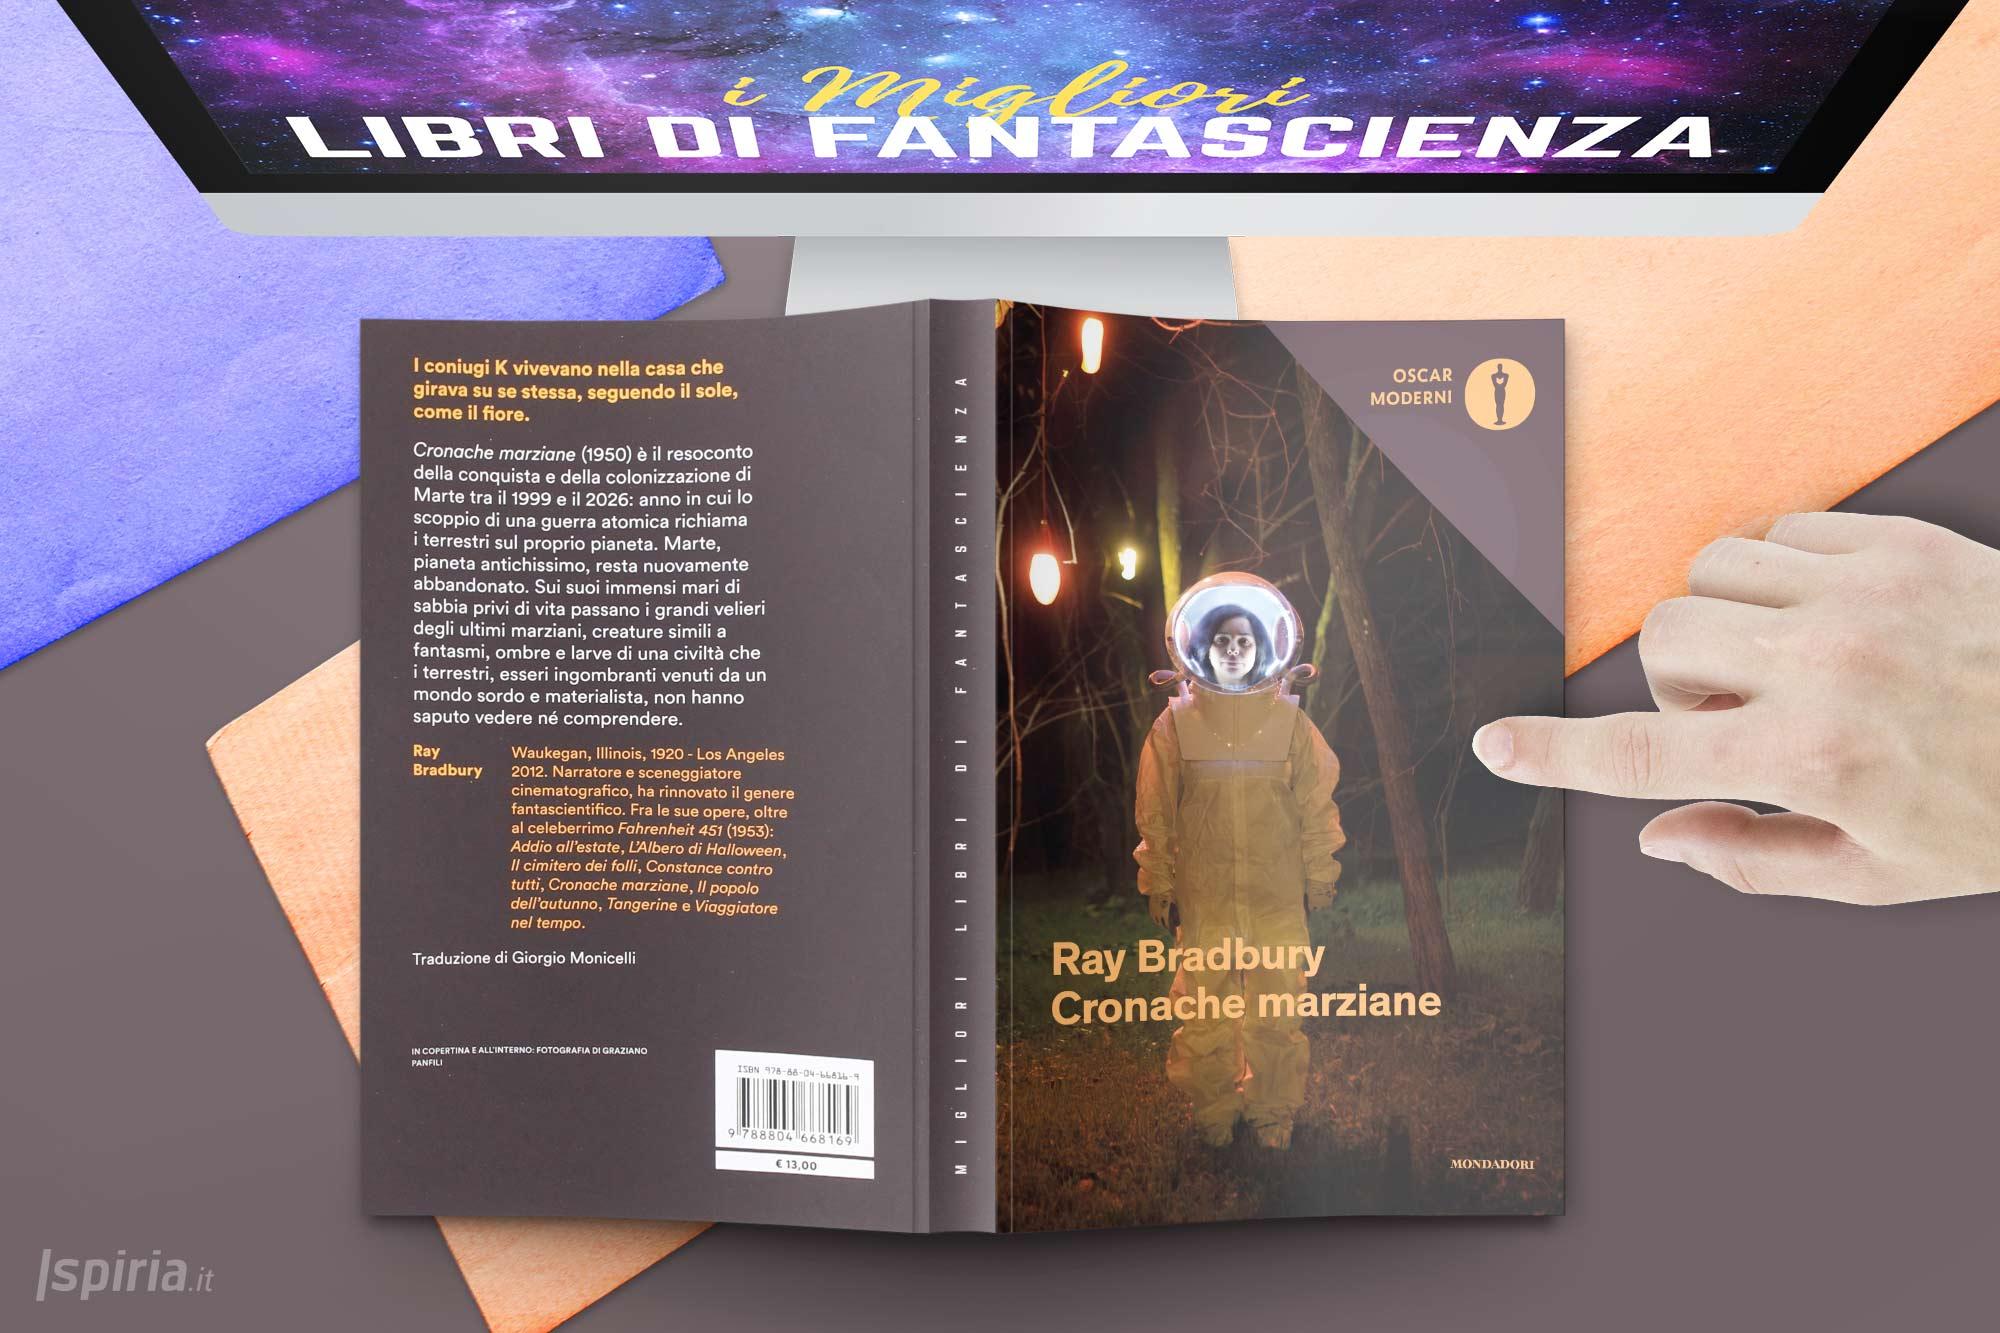 cronache-marziane-migliori-libri-fantascienza